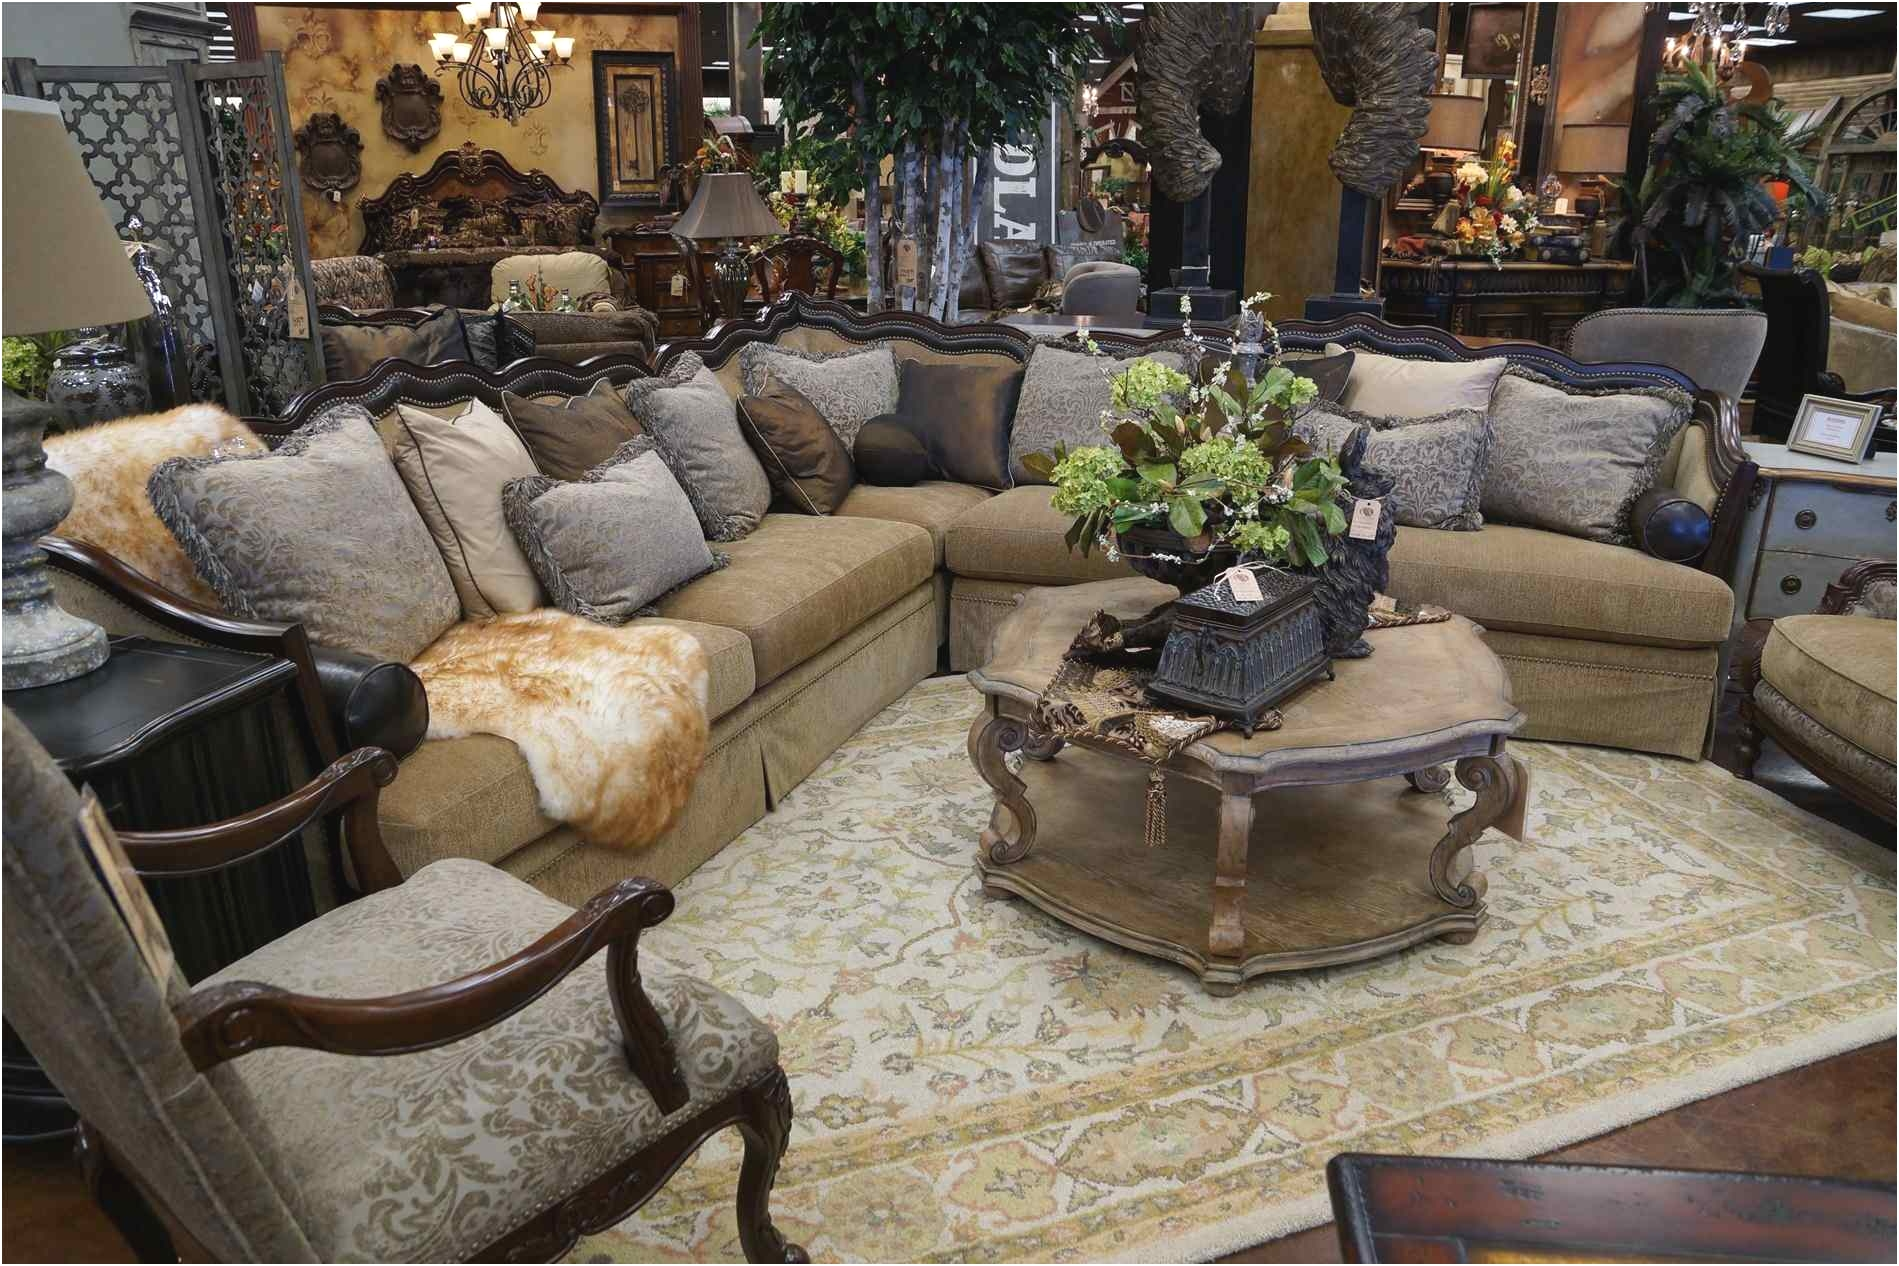 Ashley Furniture Midland Tx Inspirational ashley Furniture Midland Tx